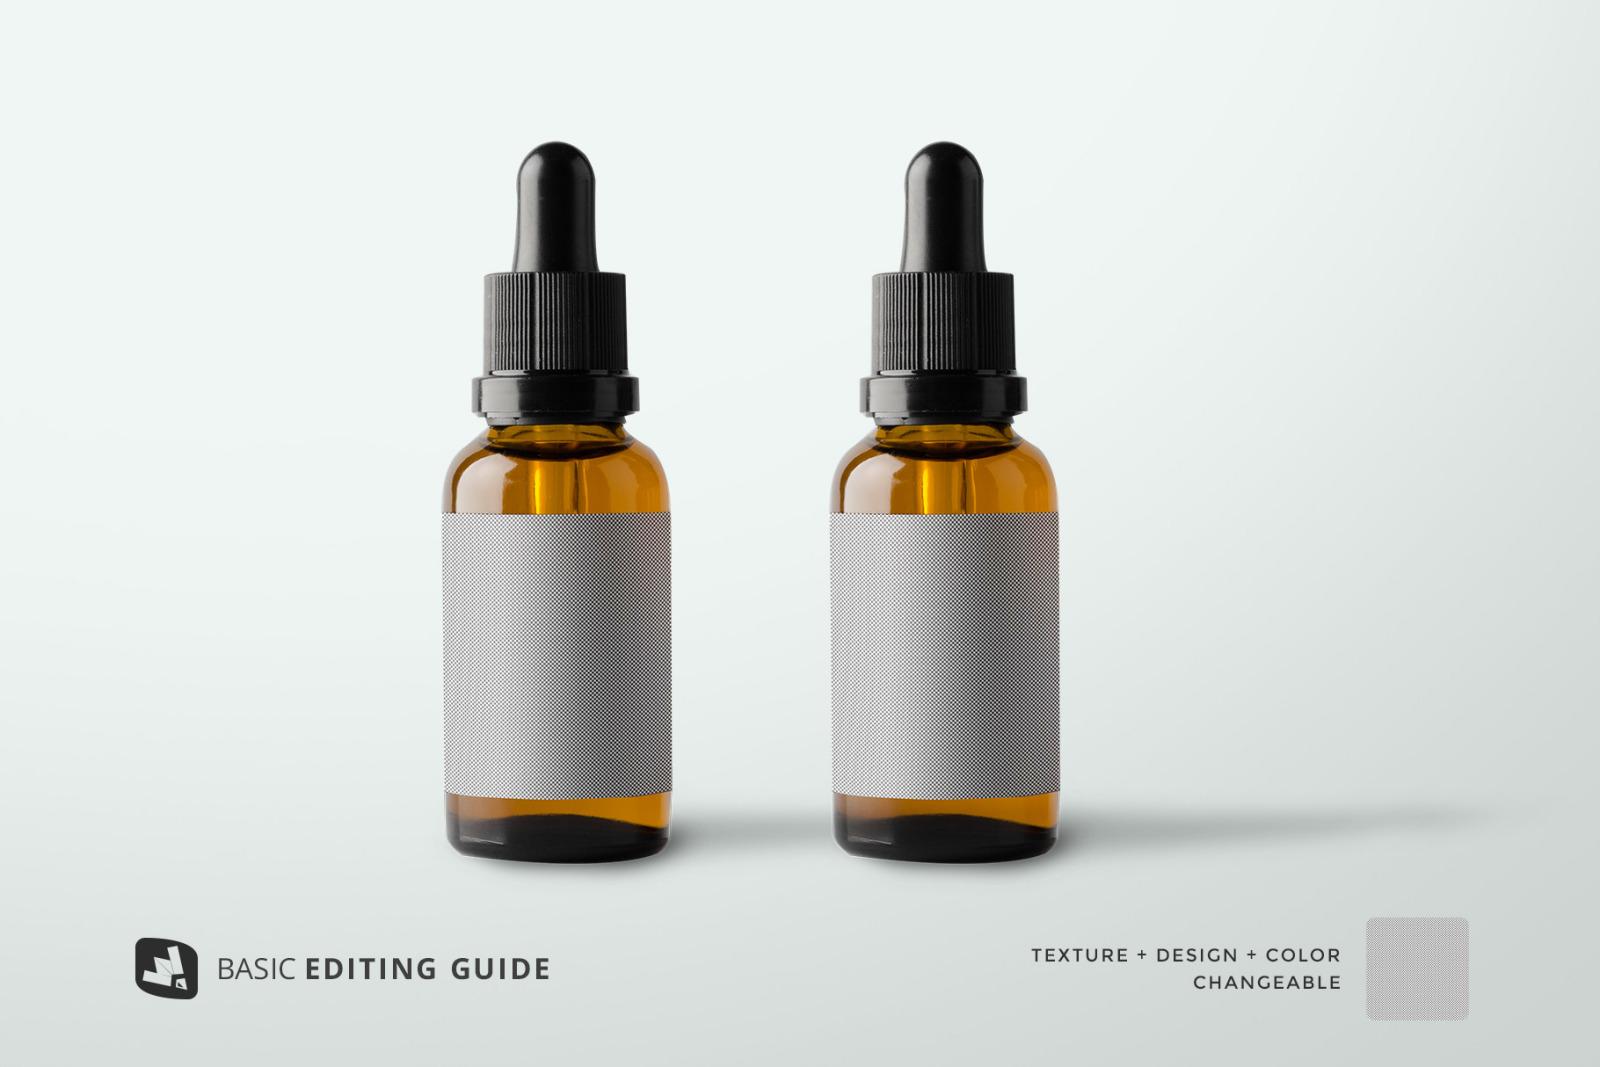 Essential Oil Bottle Packaging Mockup